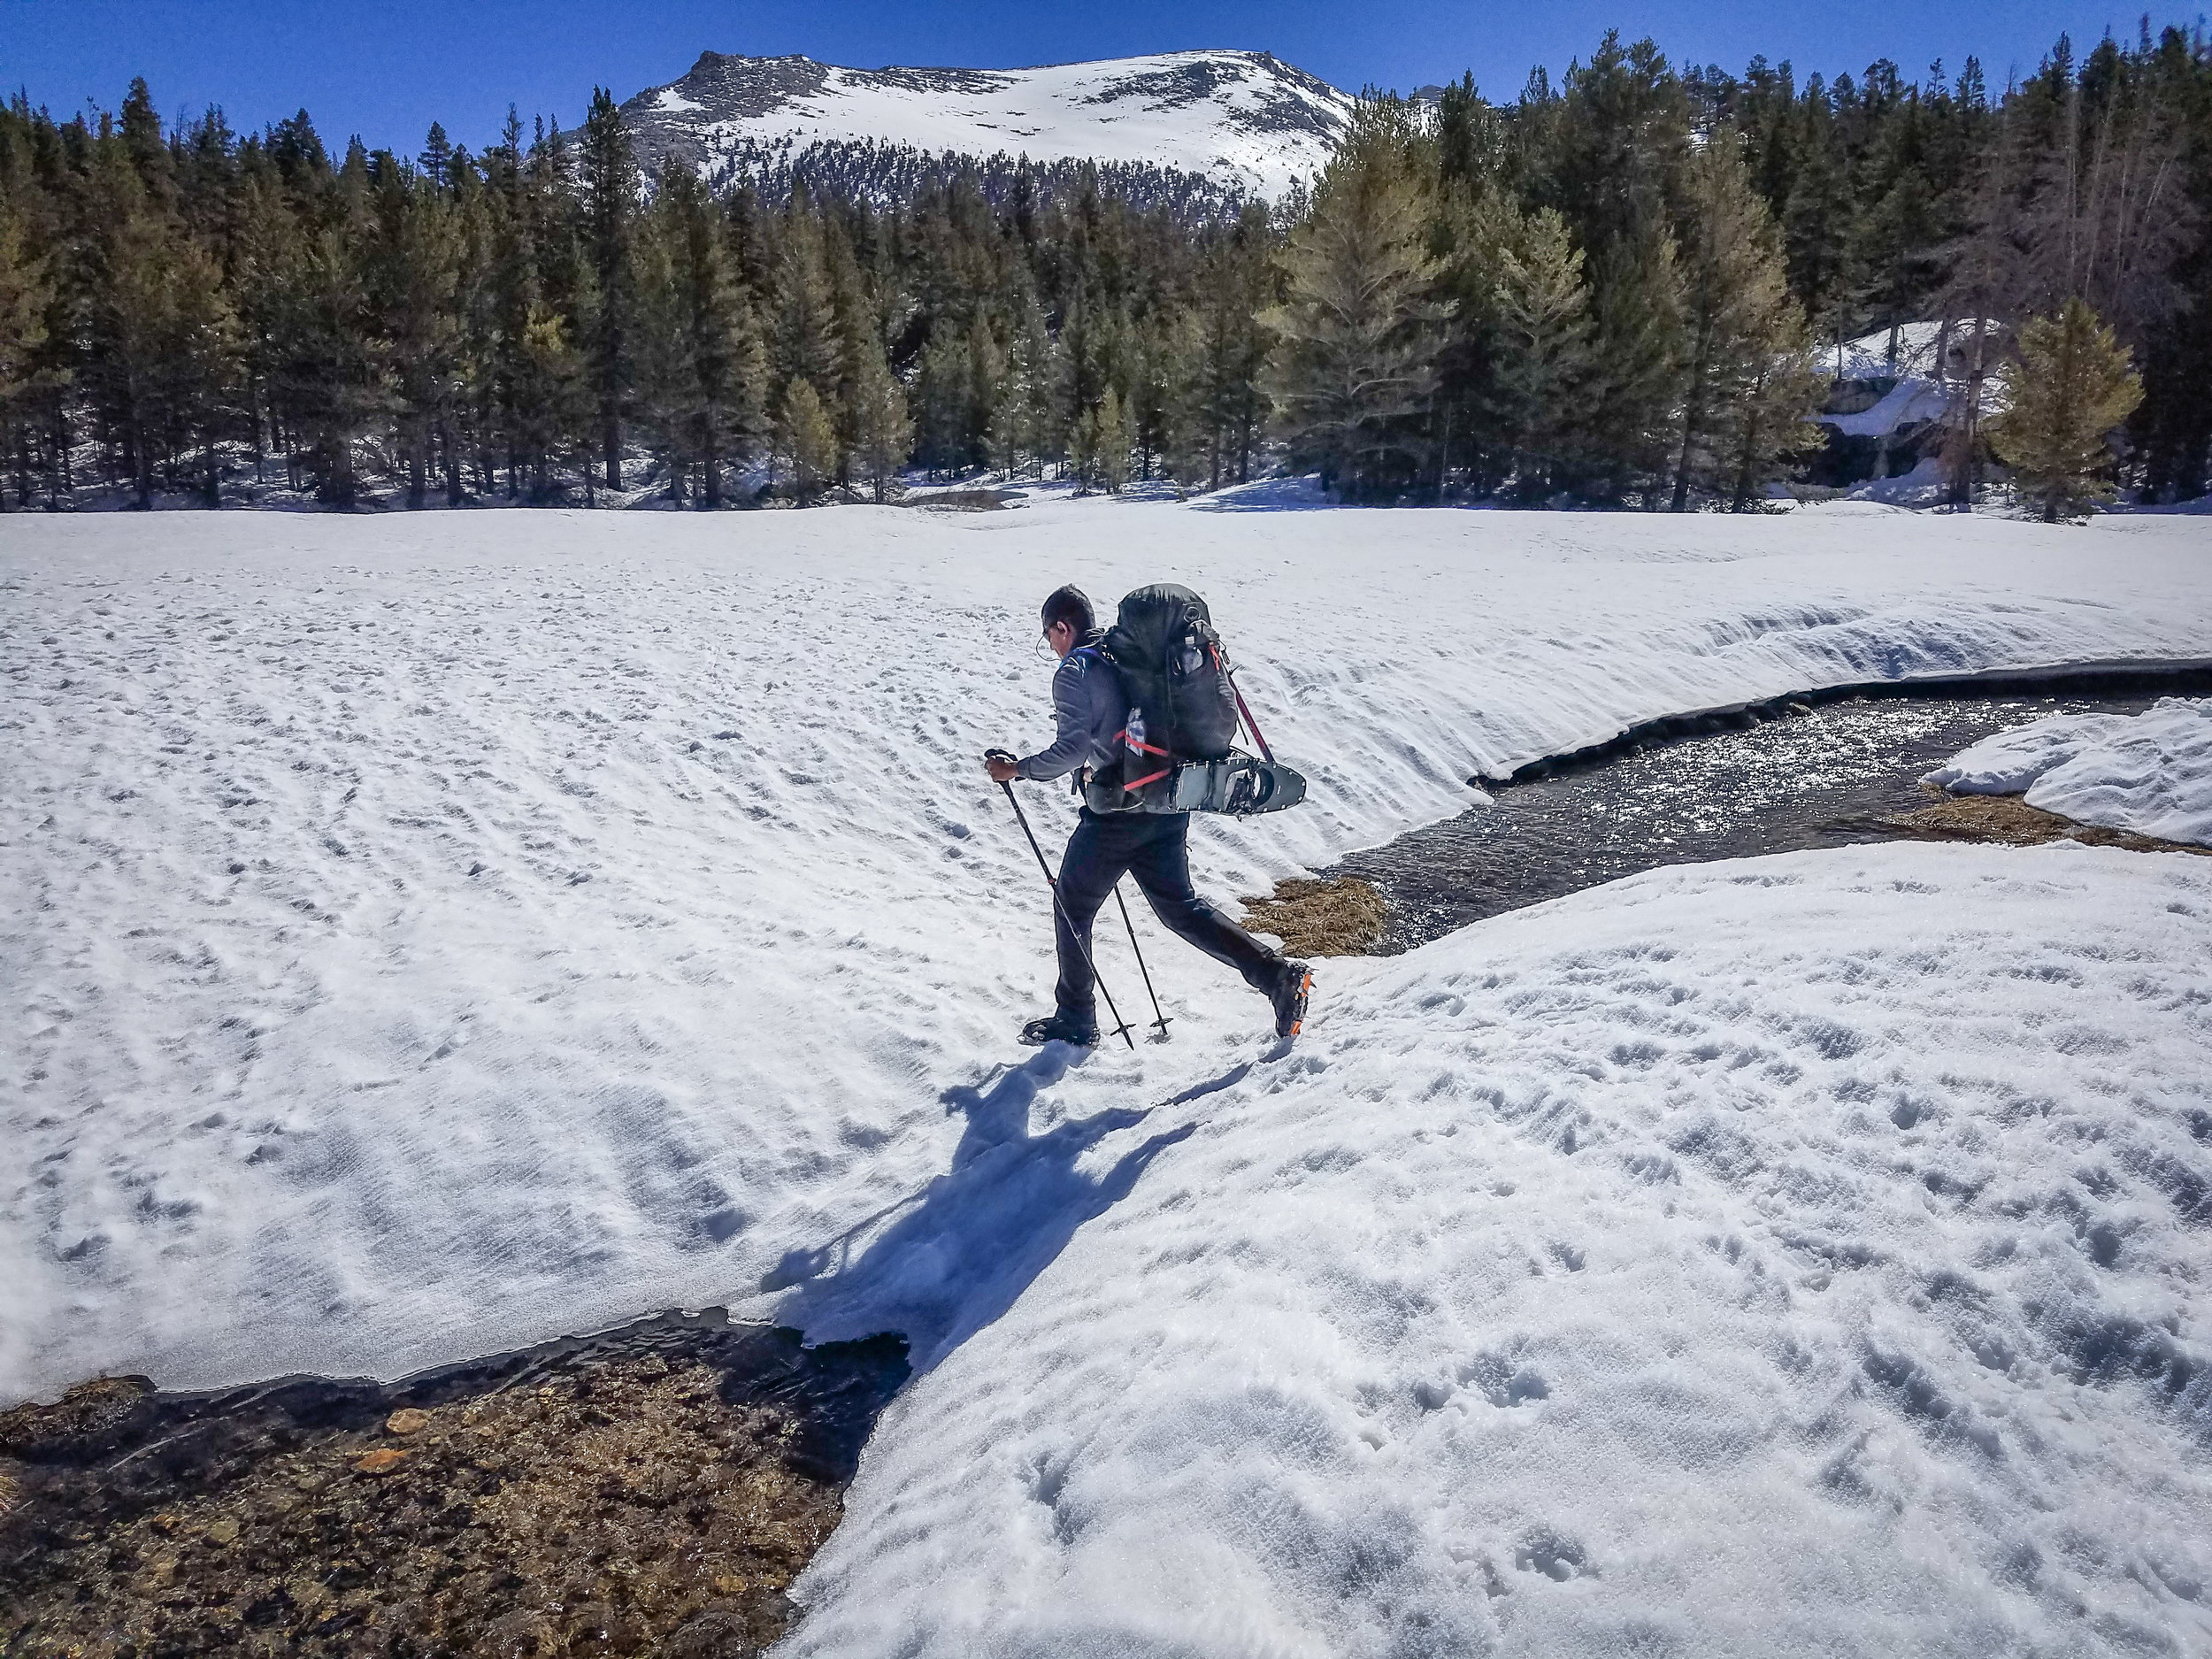 Snowbridges. The gift of the early season.